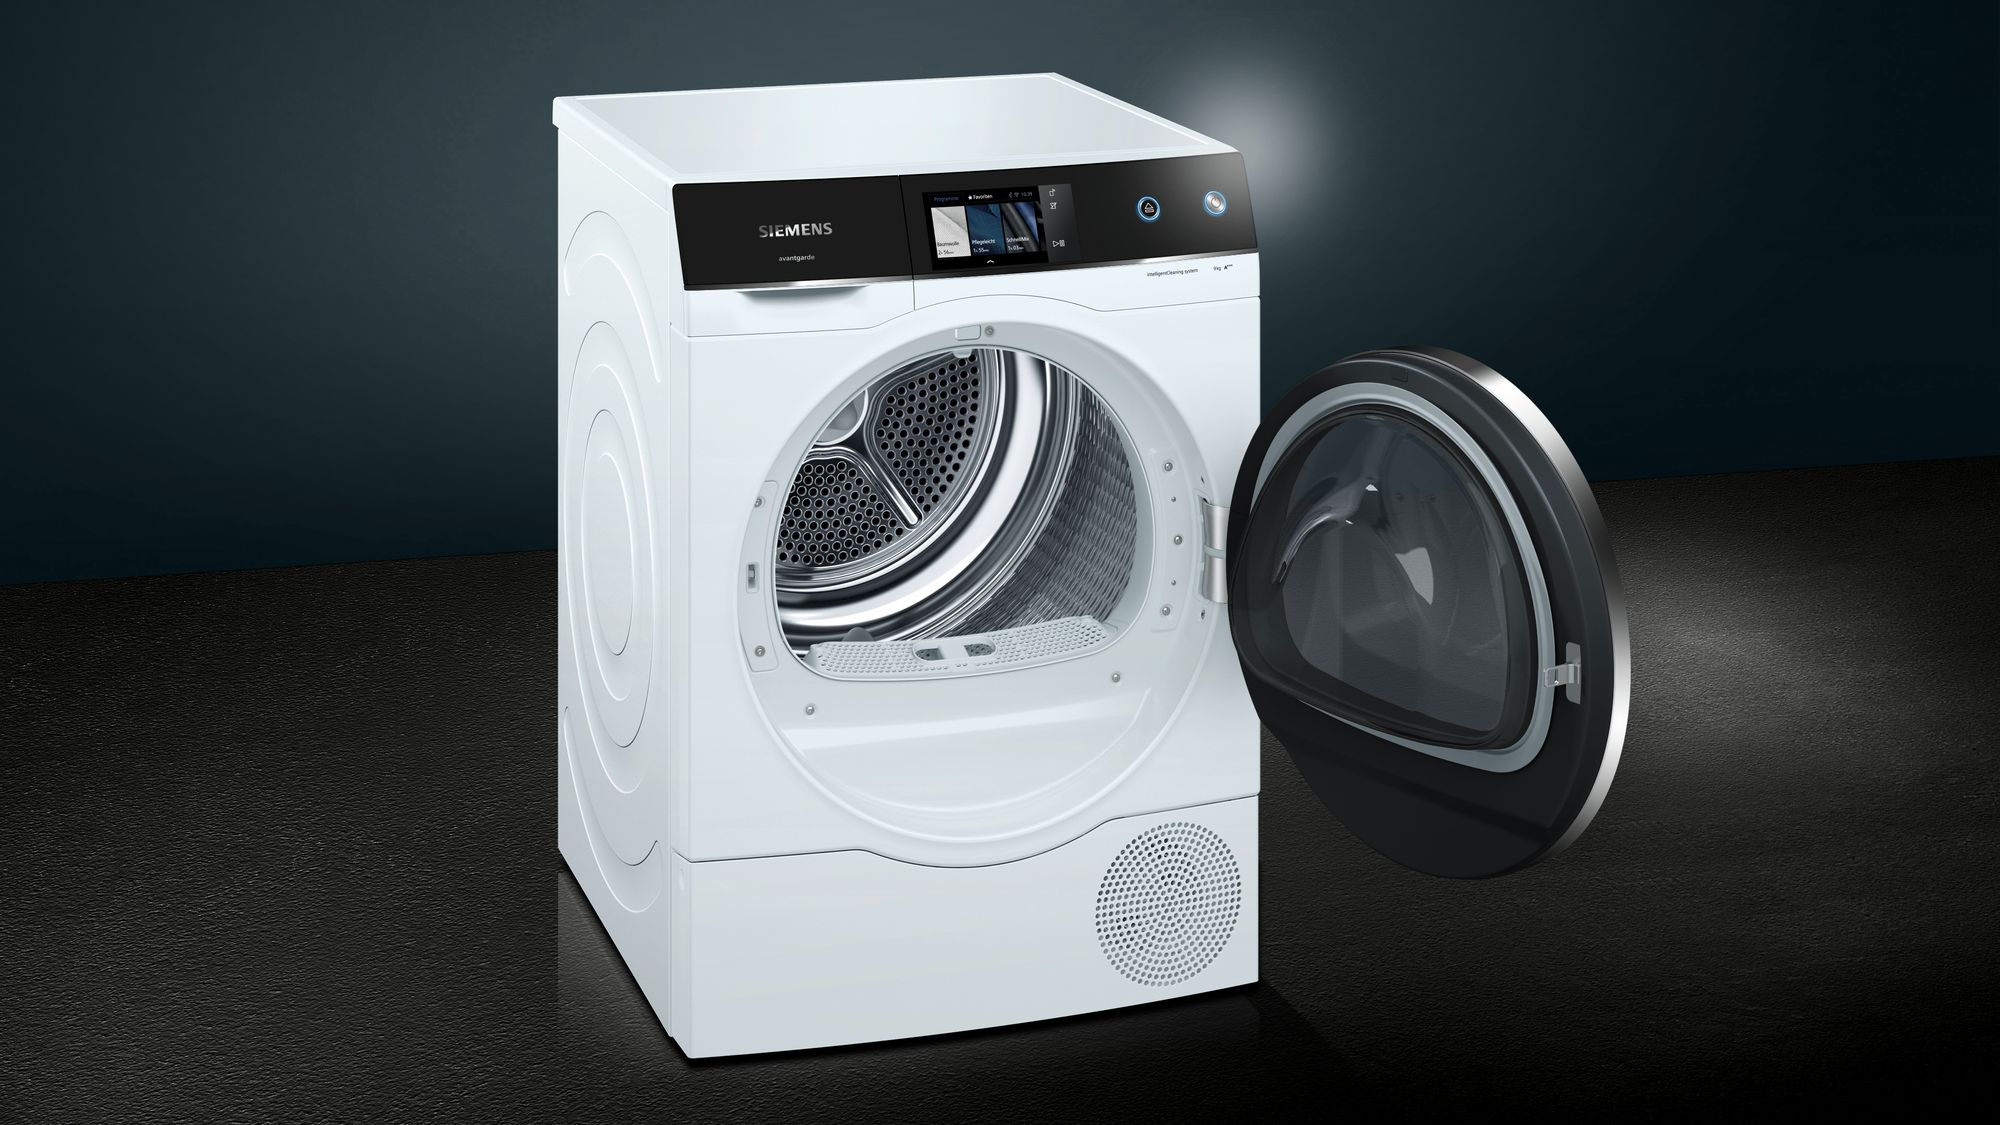 Siemens-Wärmepumpentrockner_WT47X940EU_7